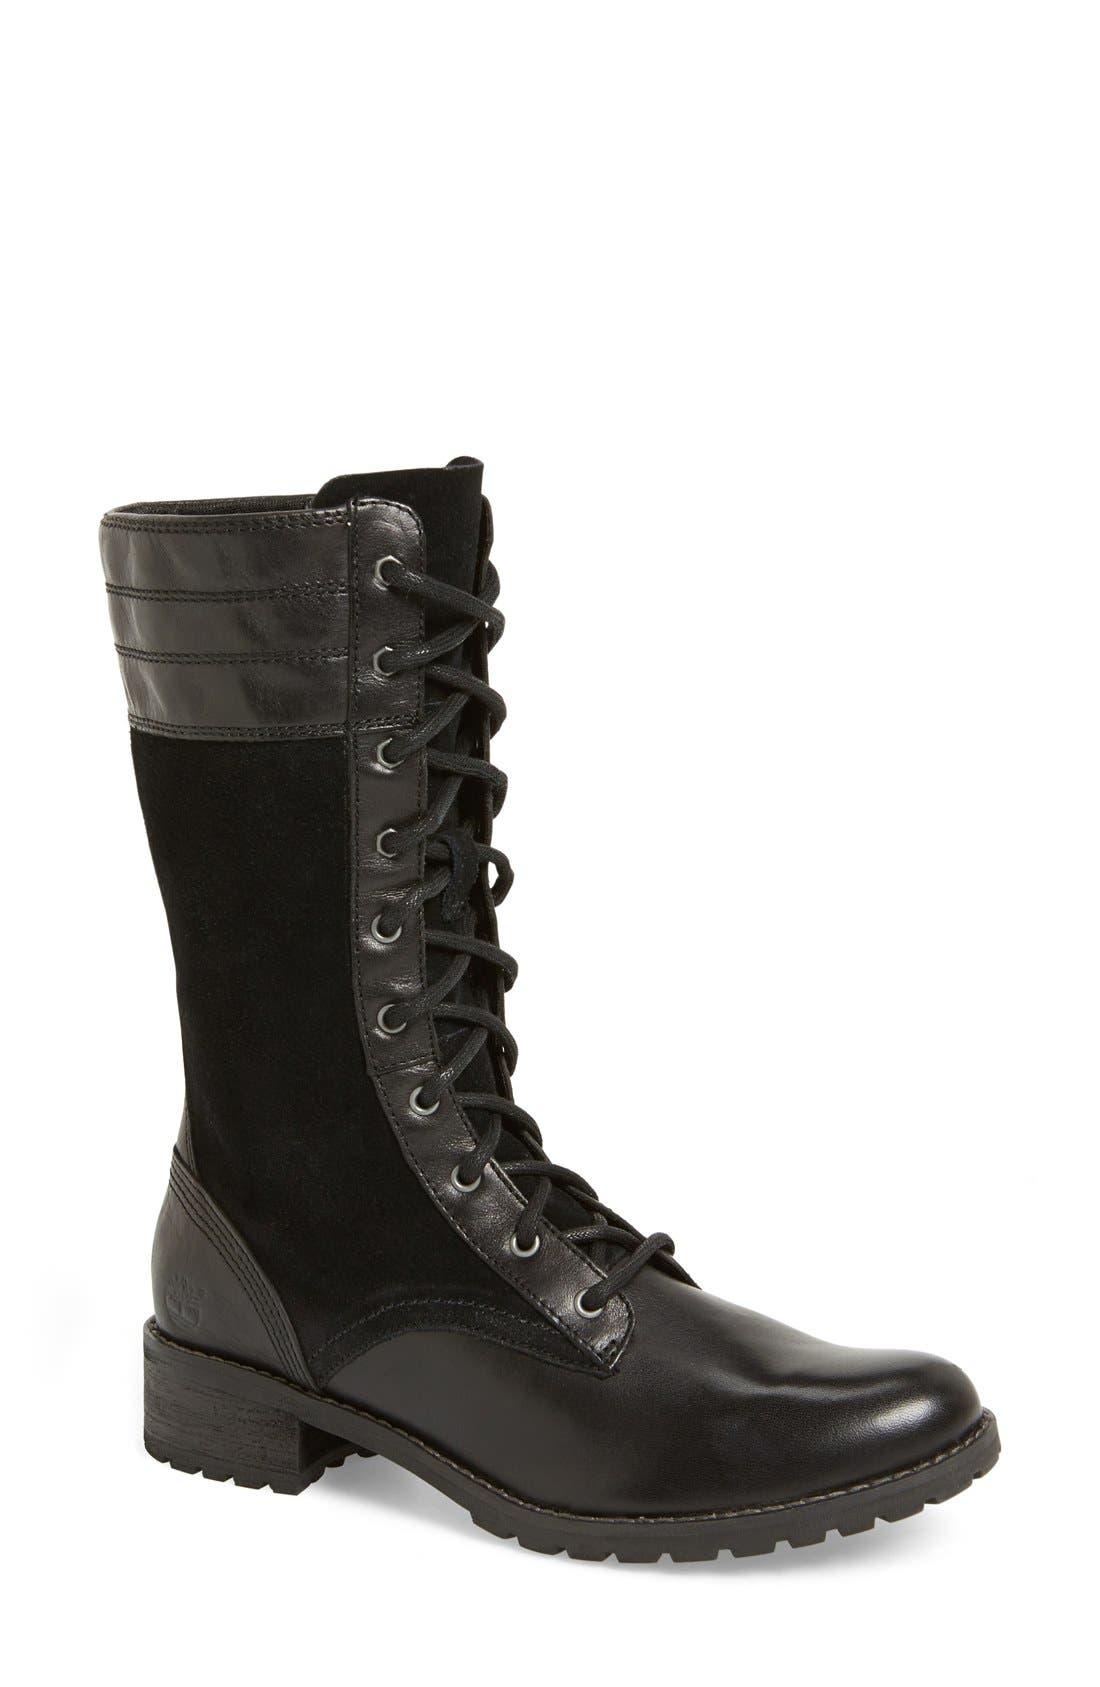 Alternate Image 1 Selected - Timberland 'Bethel' Boot (Women)